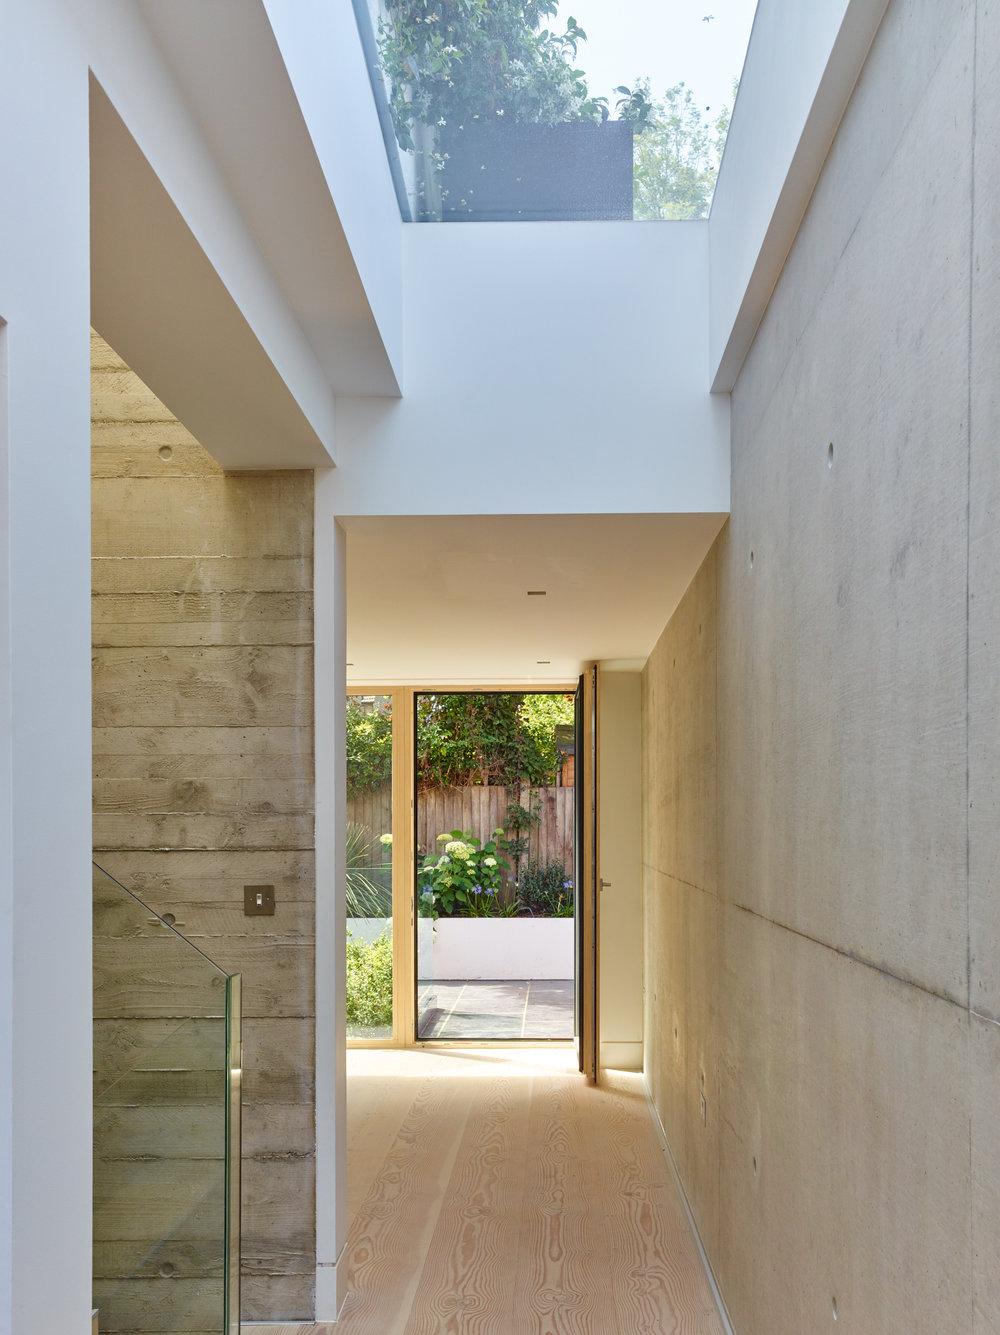 150710 RDA W4 passive house  034.jpg